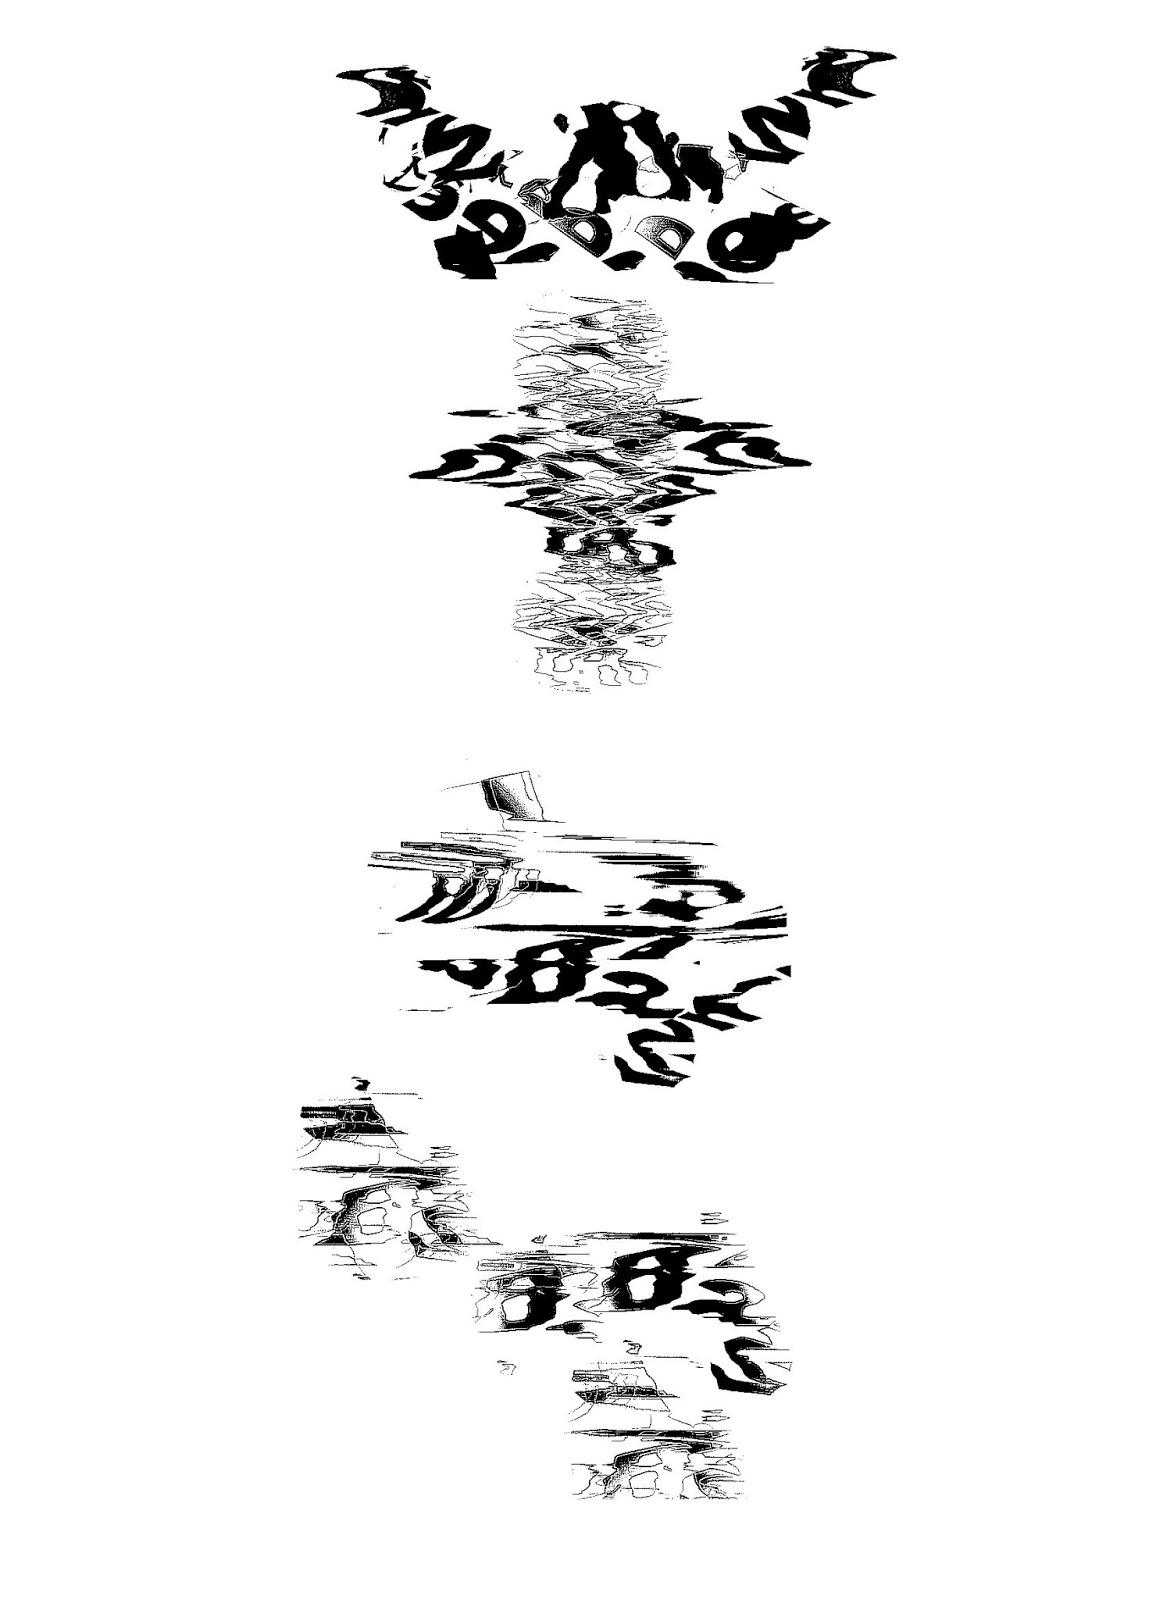 visoundtextpoem: modular poem for carl andre